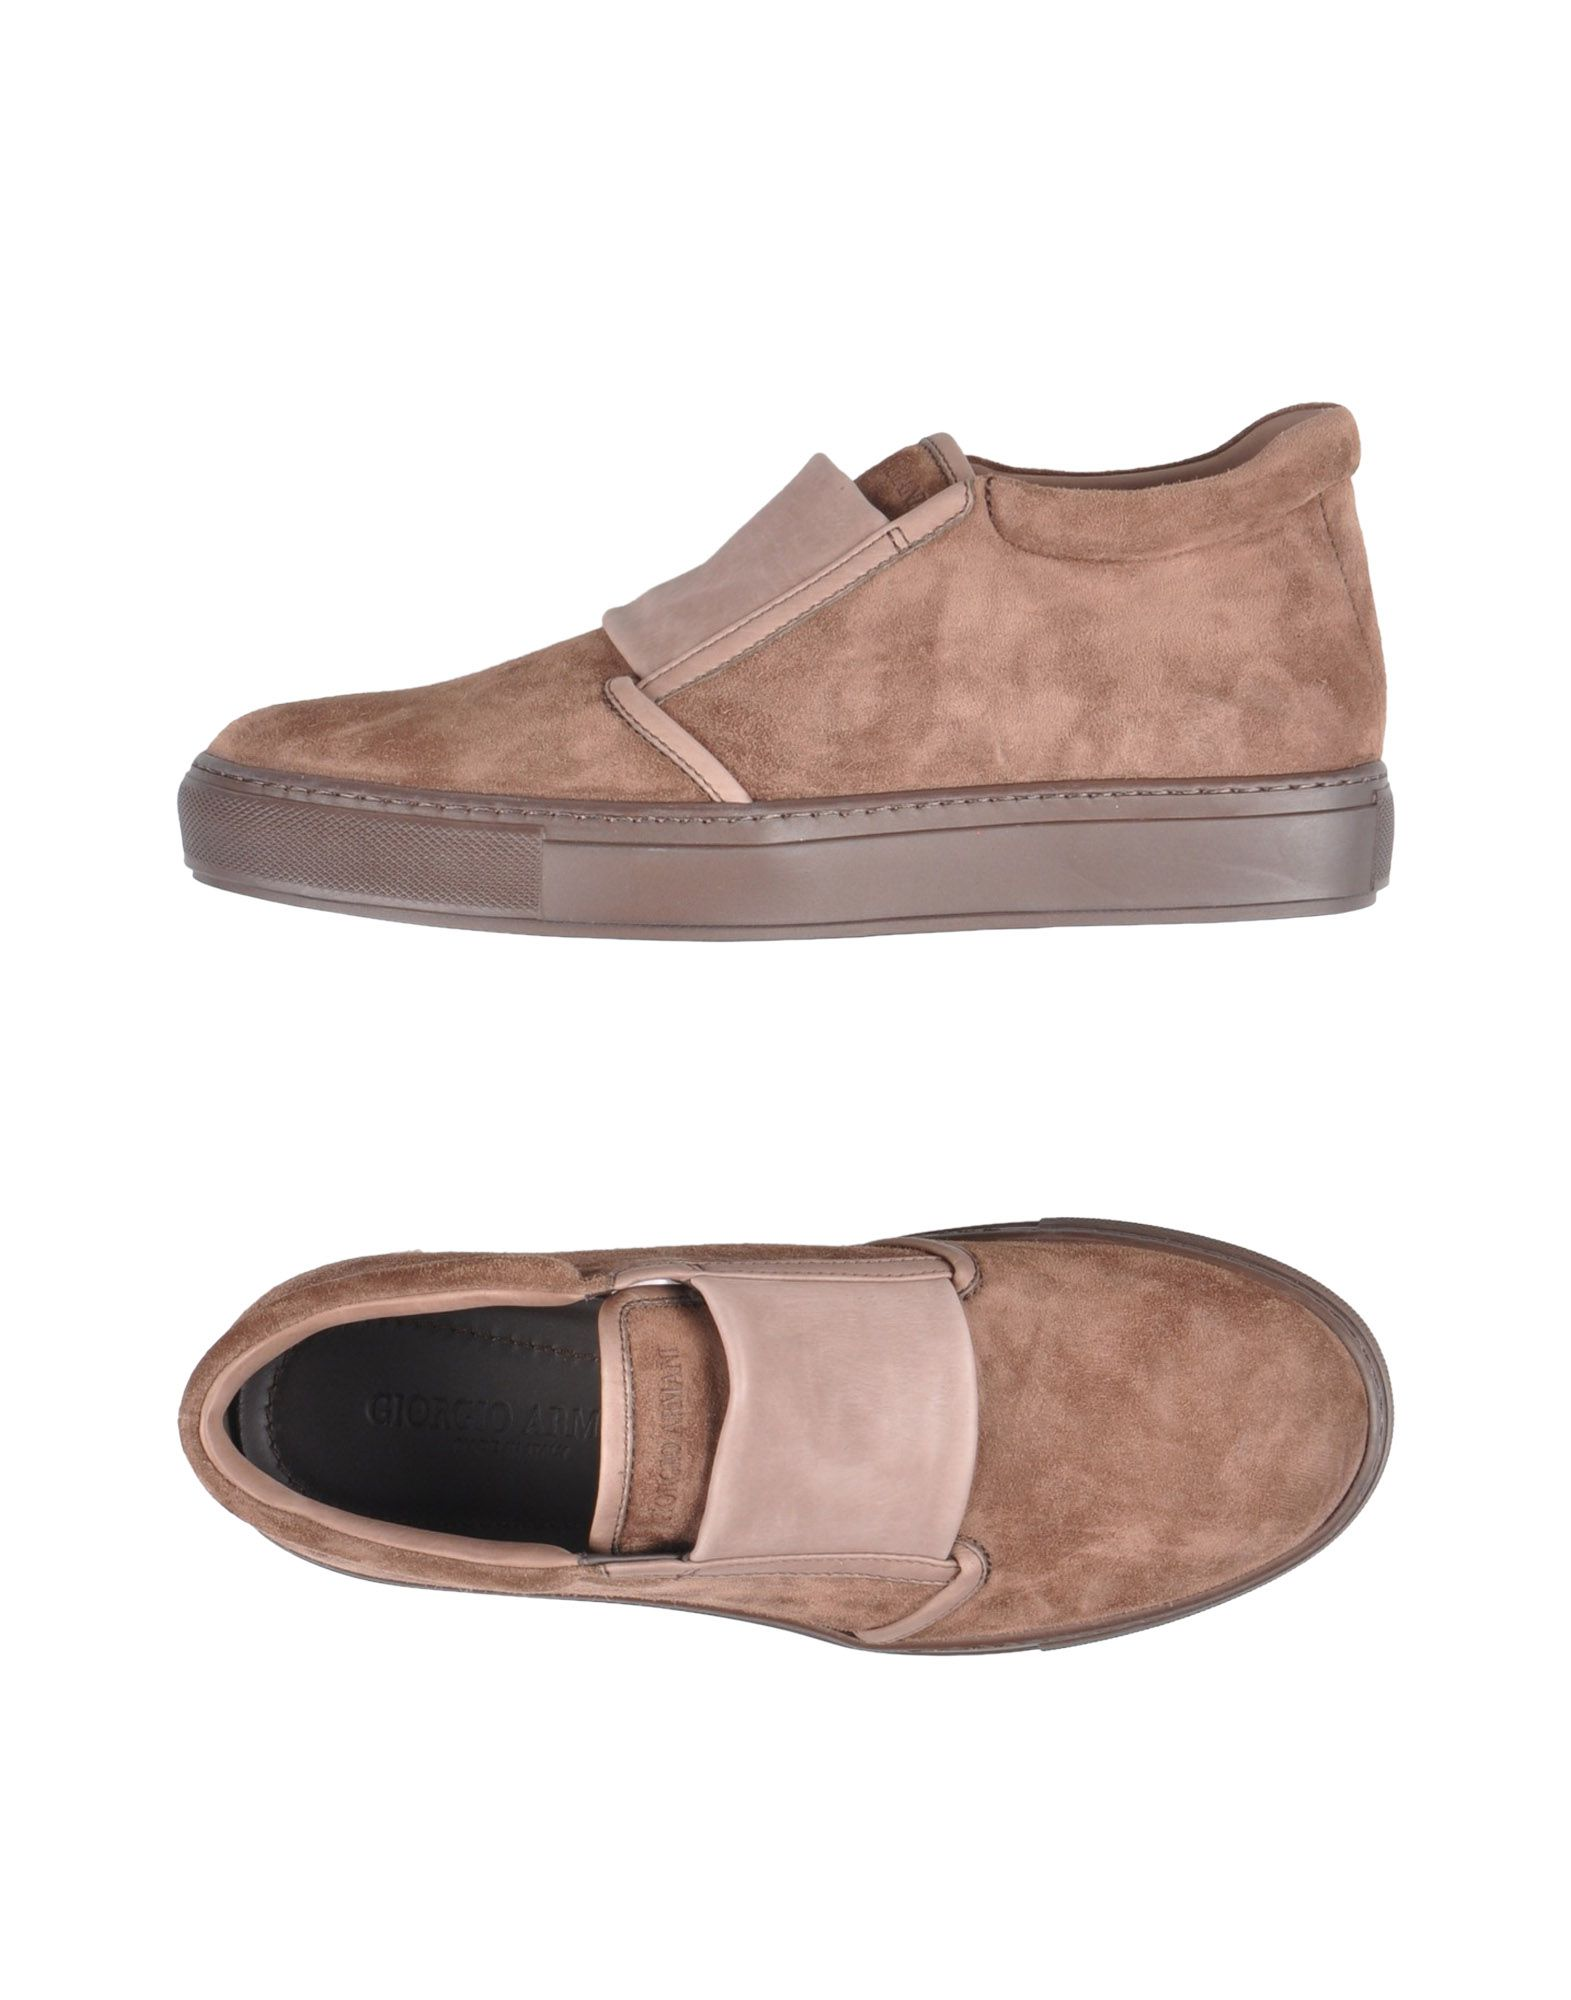 Sneakers Giorgio Armani Homme - Sneakers Giorgio Armani  Marron Spécial temps limité